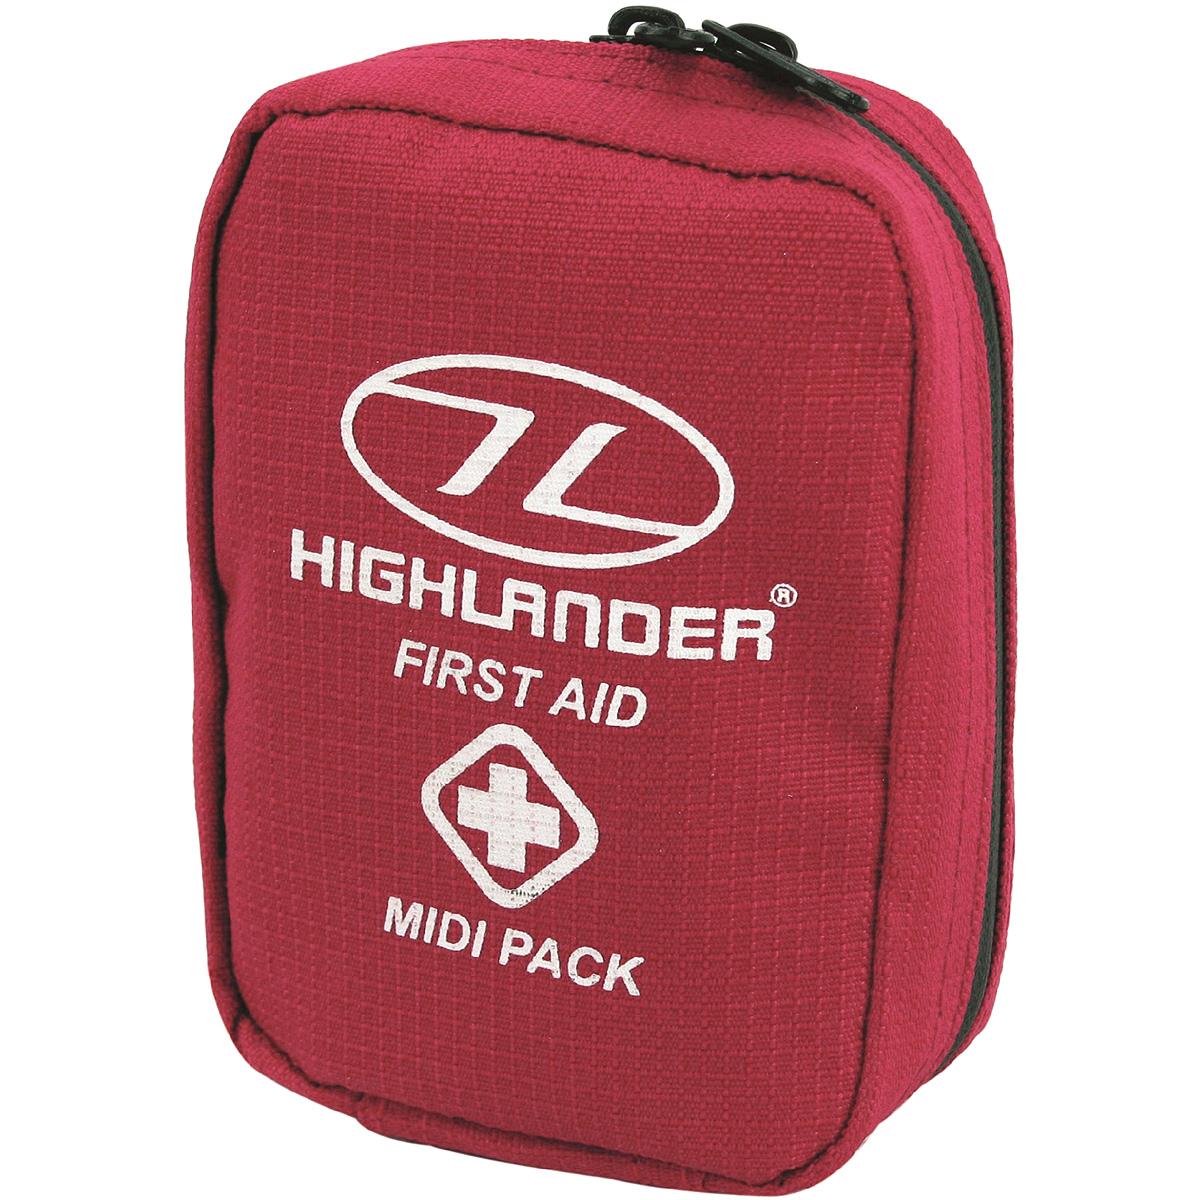 highlander erste hilfe notfall midi pack verletzung rescue bandage reisetasche r 5034358171018. Black Bedroom Furniture Sets. Home Design Ideas